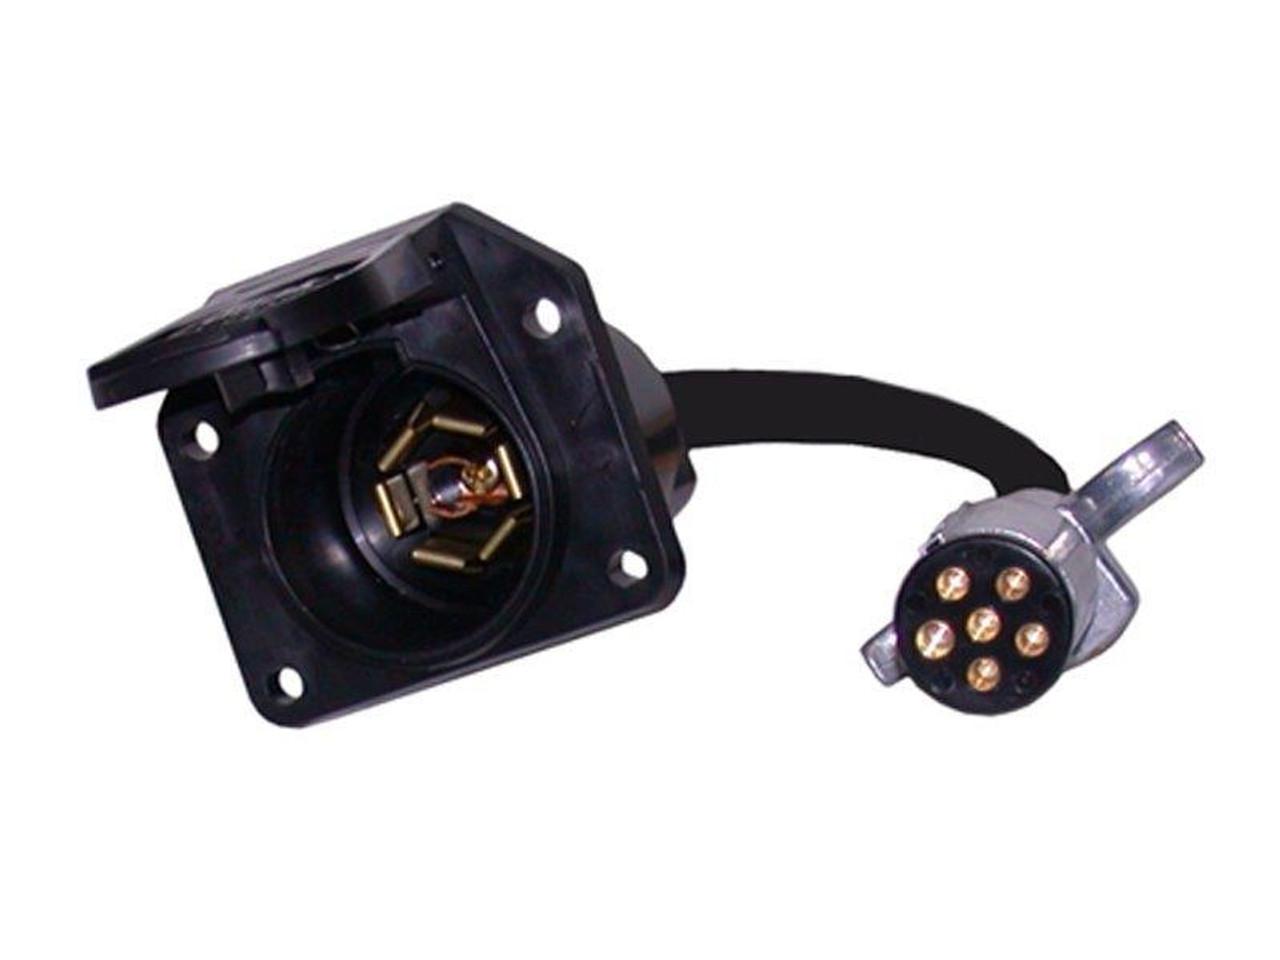 603PW/77S --- 6-Way Round to 7-Way Flat Pin Adapter